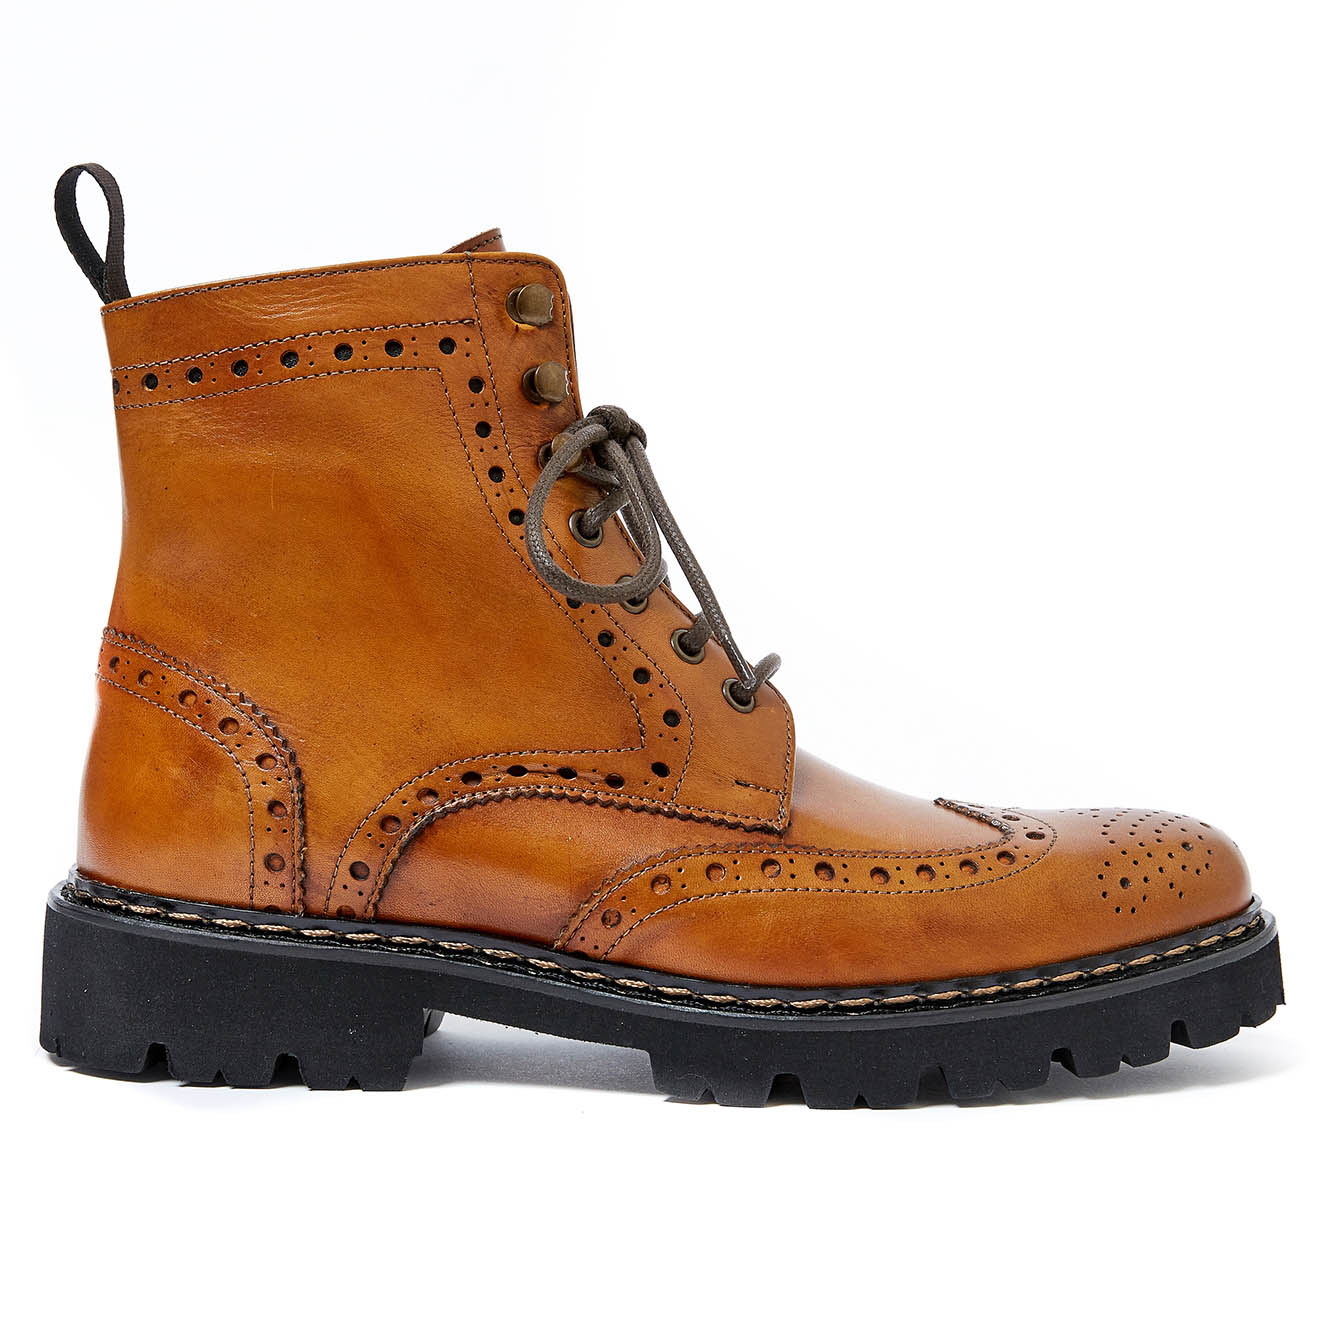 Boots en Cuir Thomas marron - British Passport - Modalova